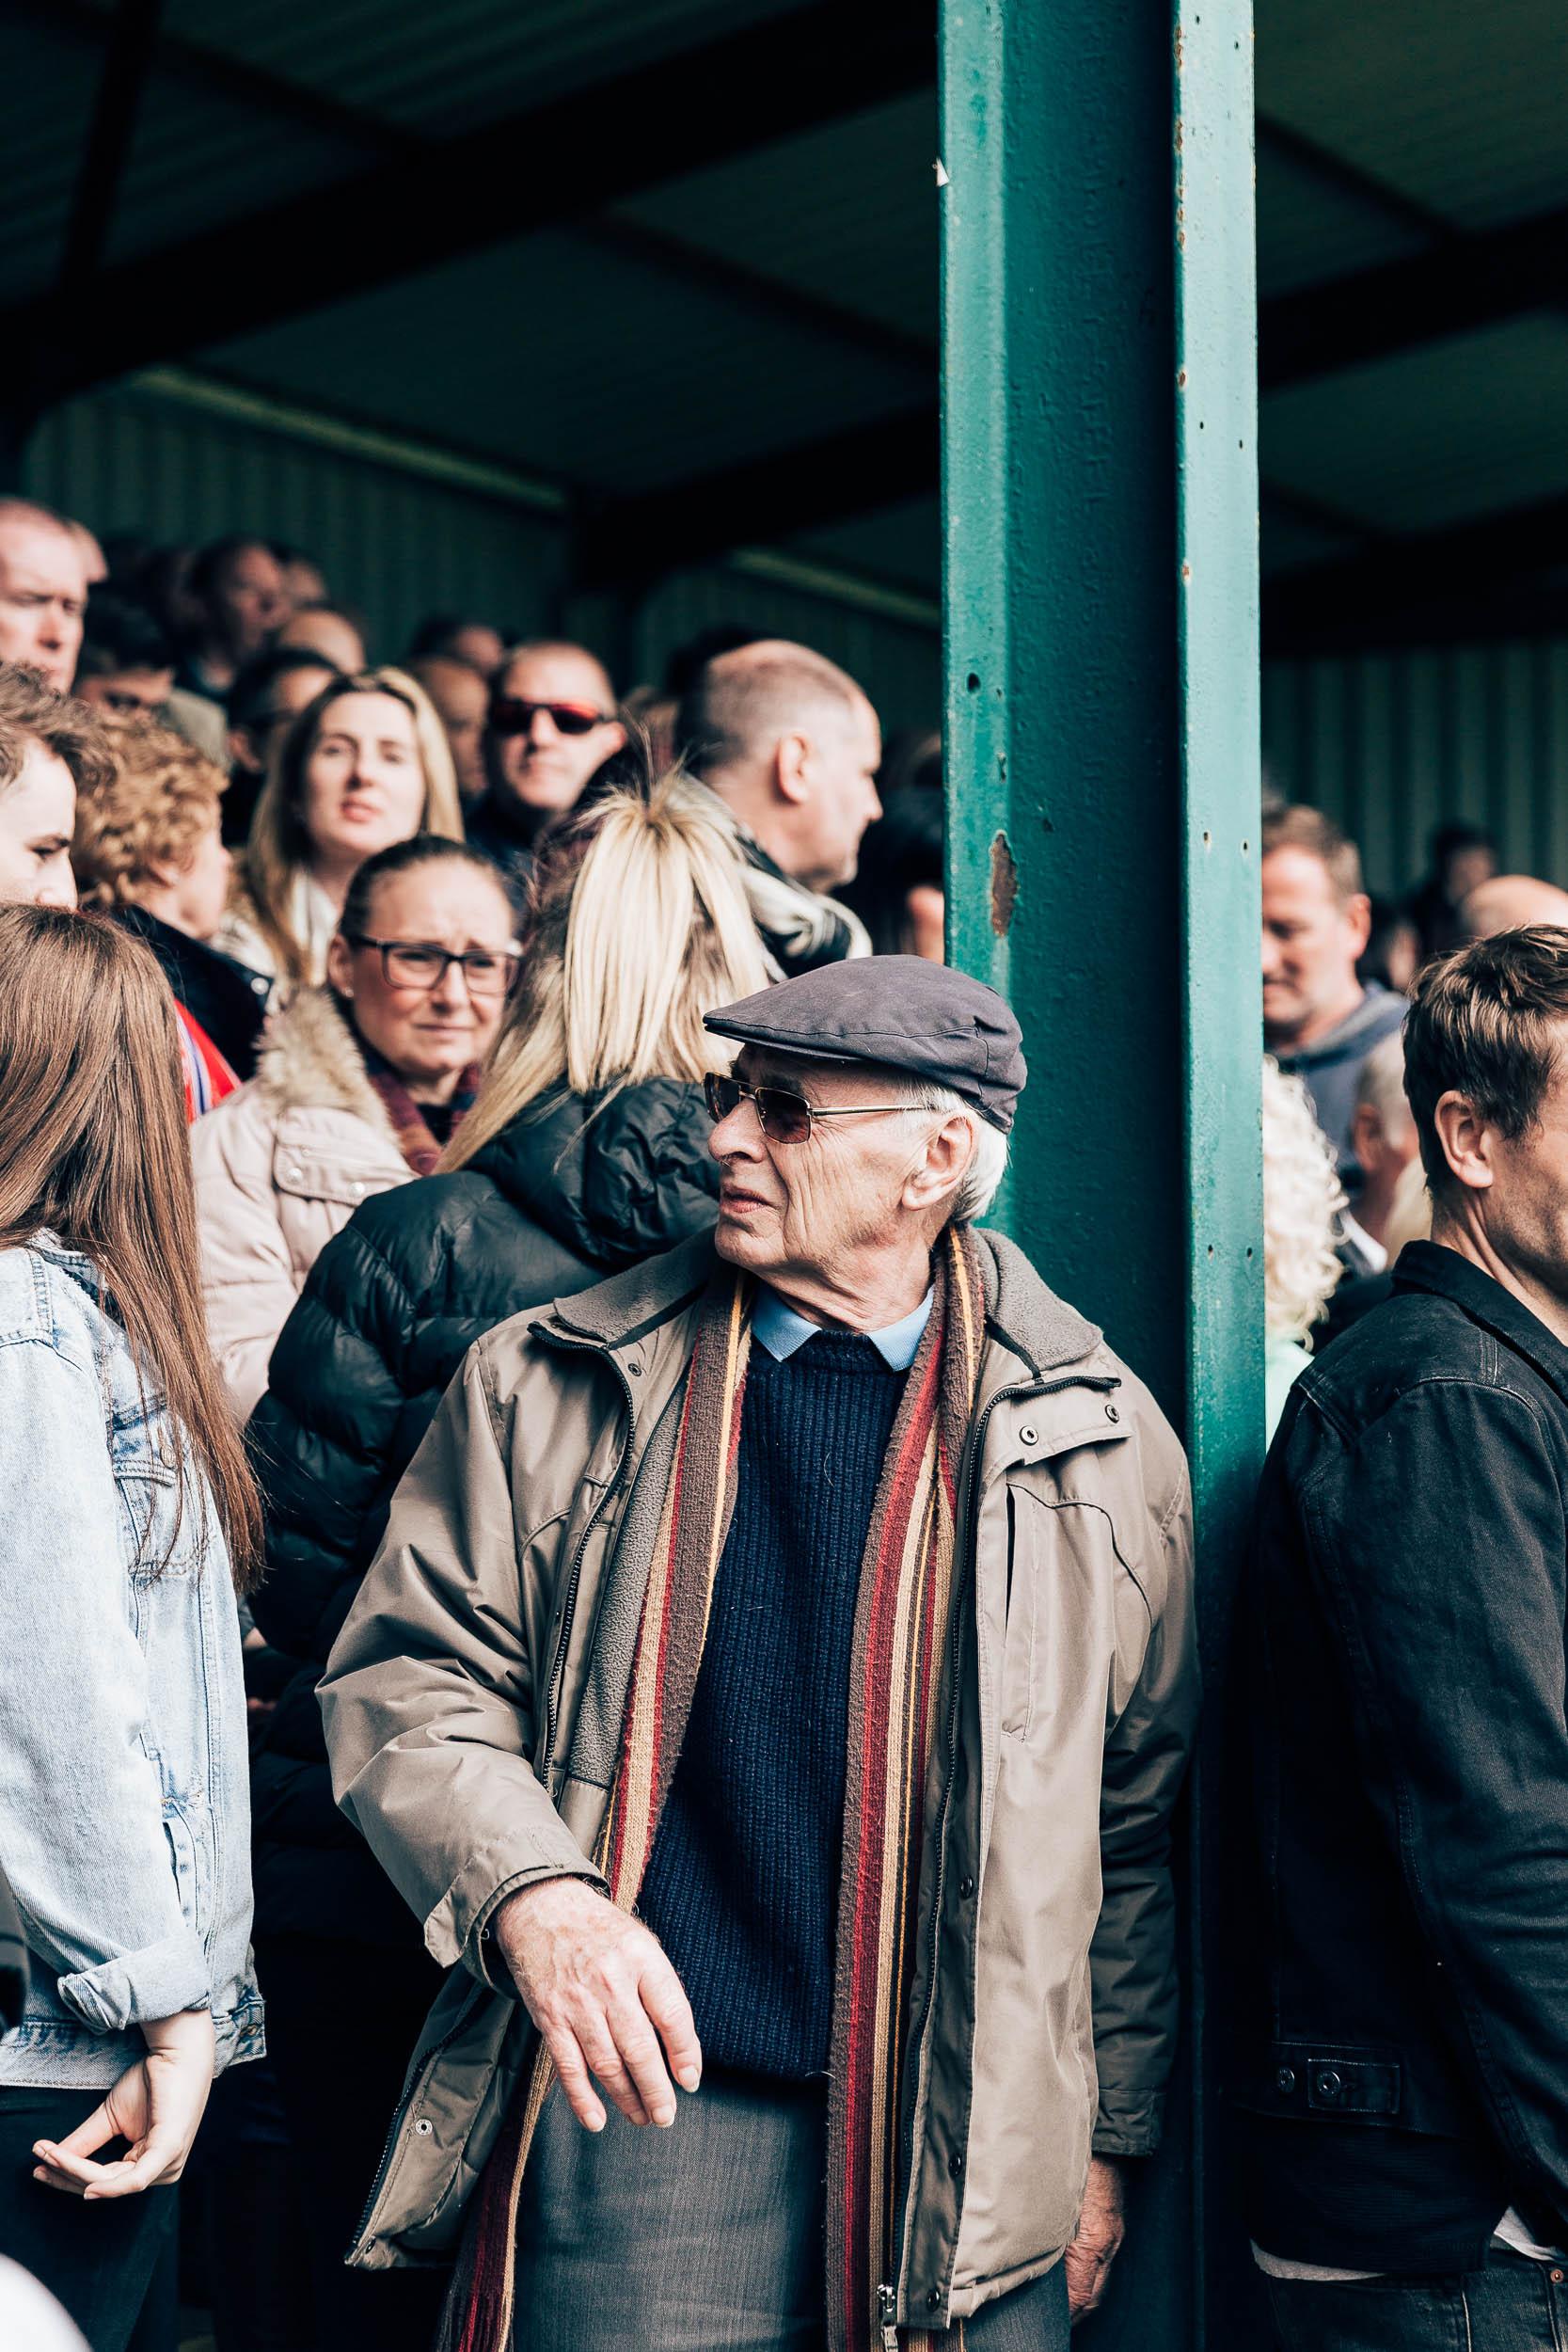 06_05_2019_Bromsgrove_Sporting_Corby-90.jpg